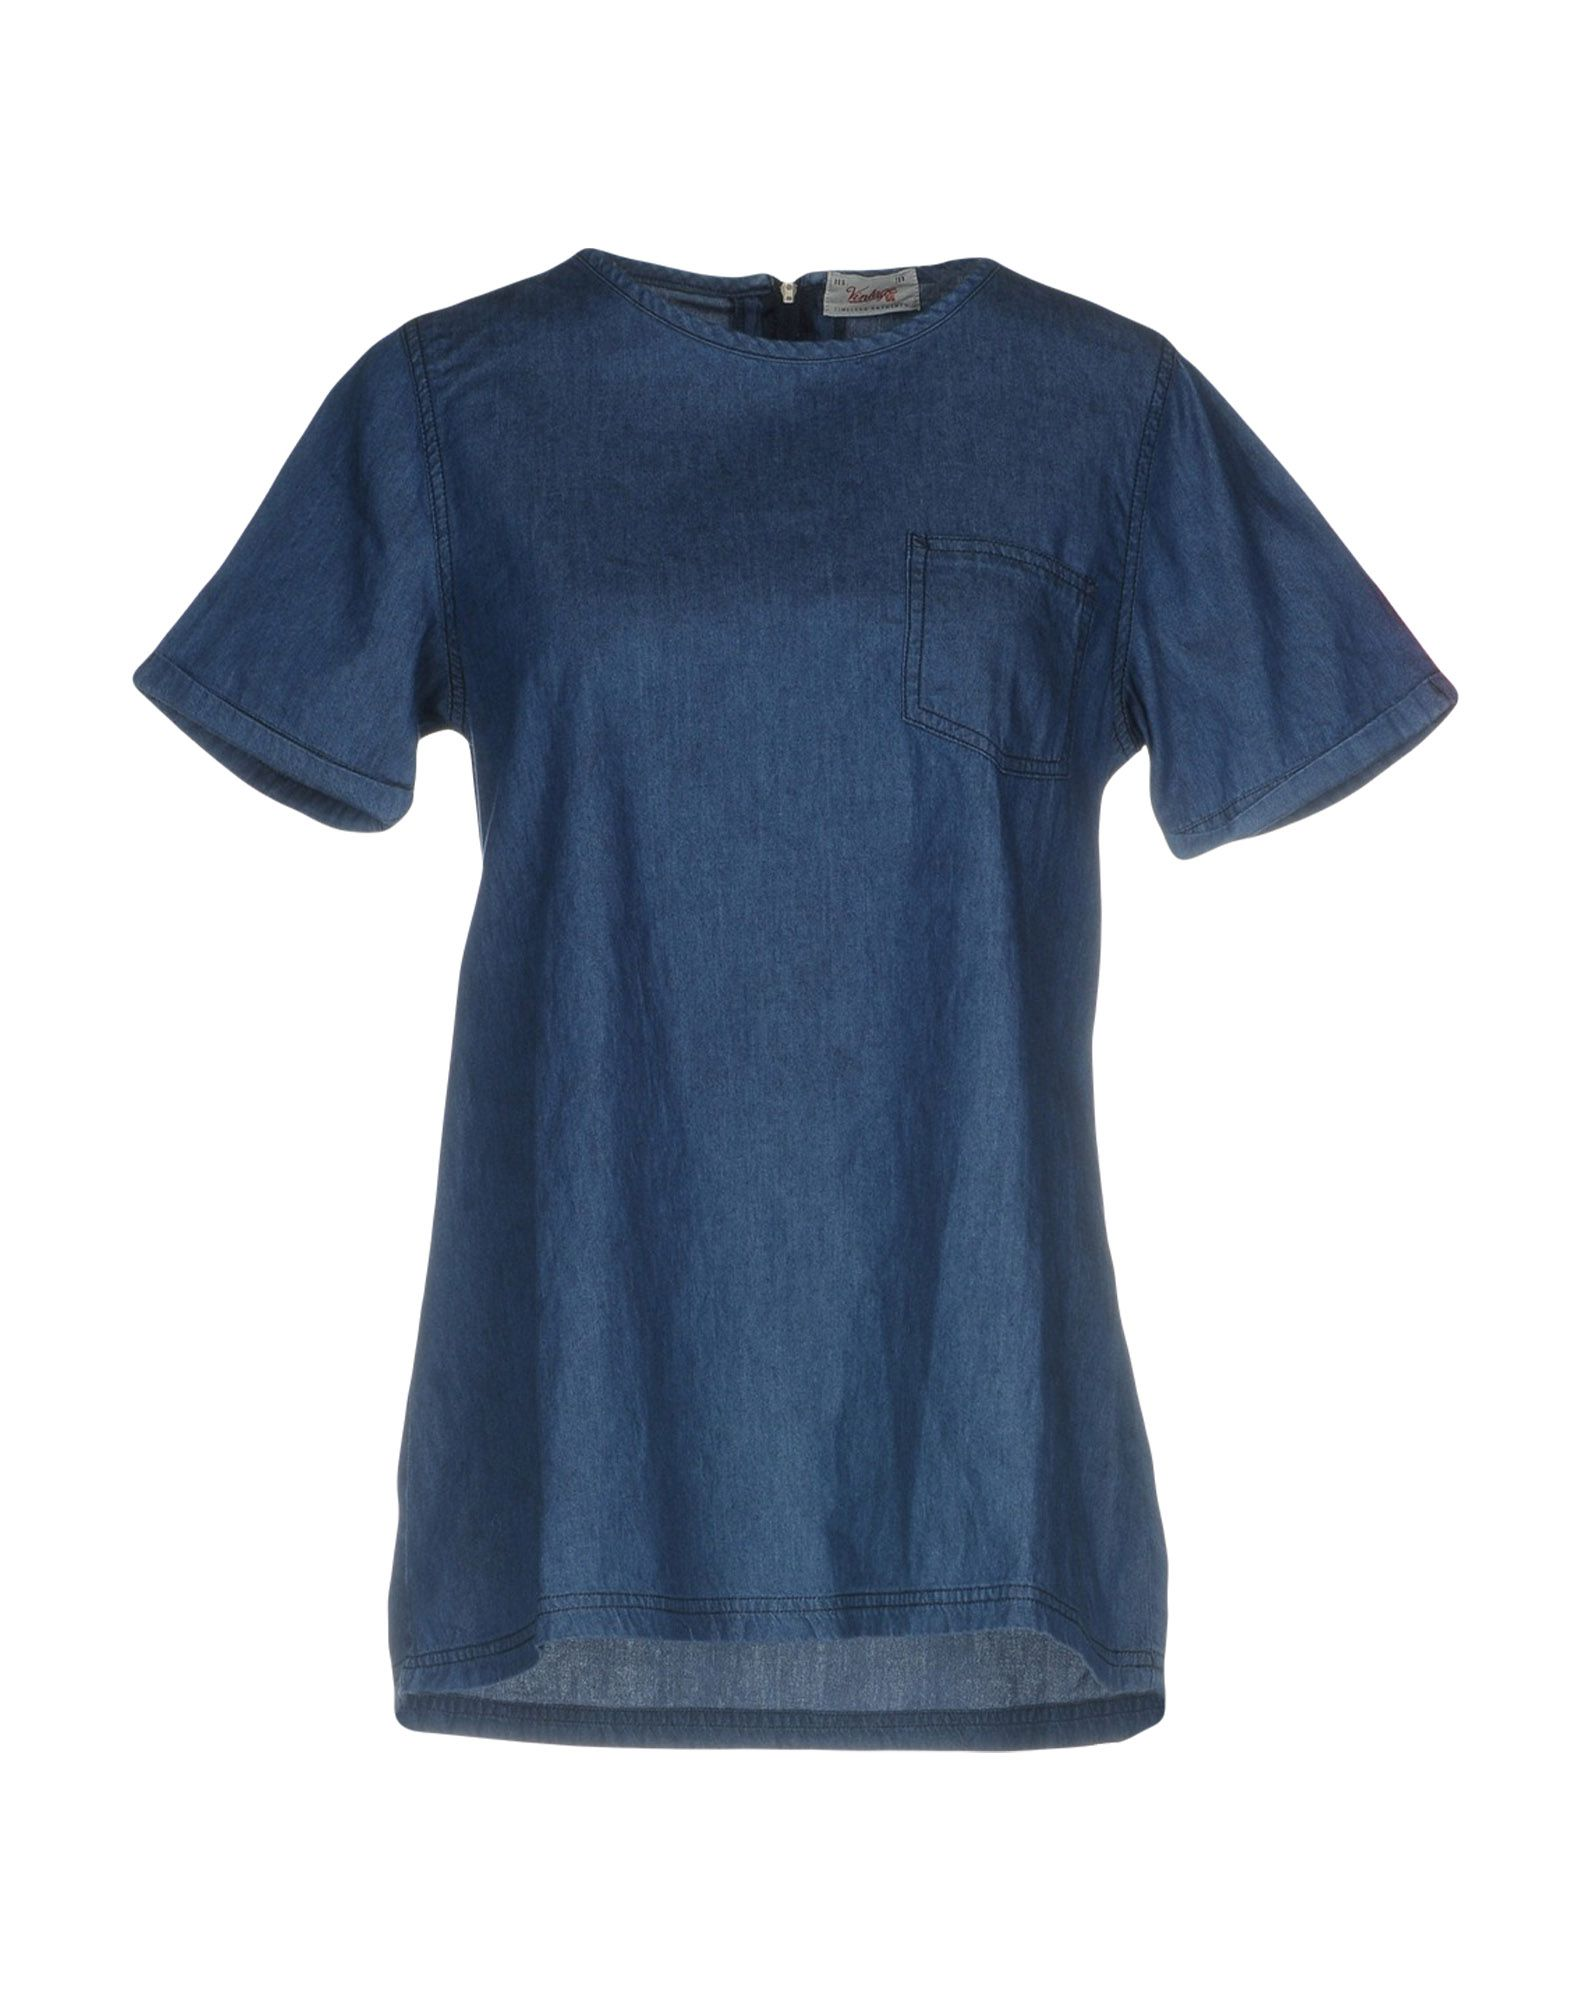 цена на VINTAGE 55 Джинсовая рубашка